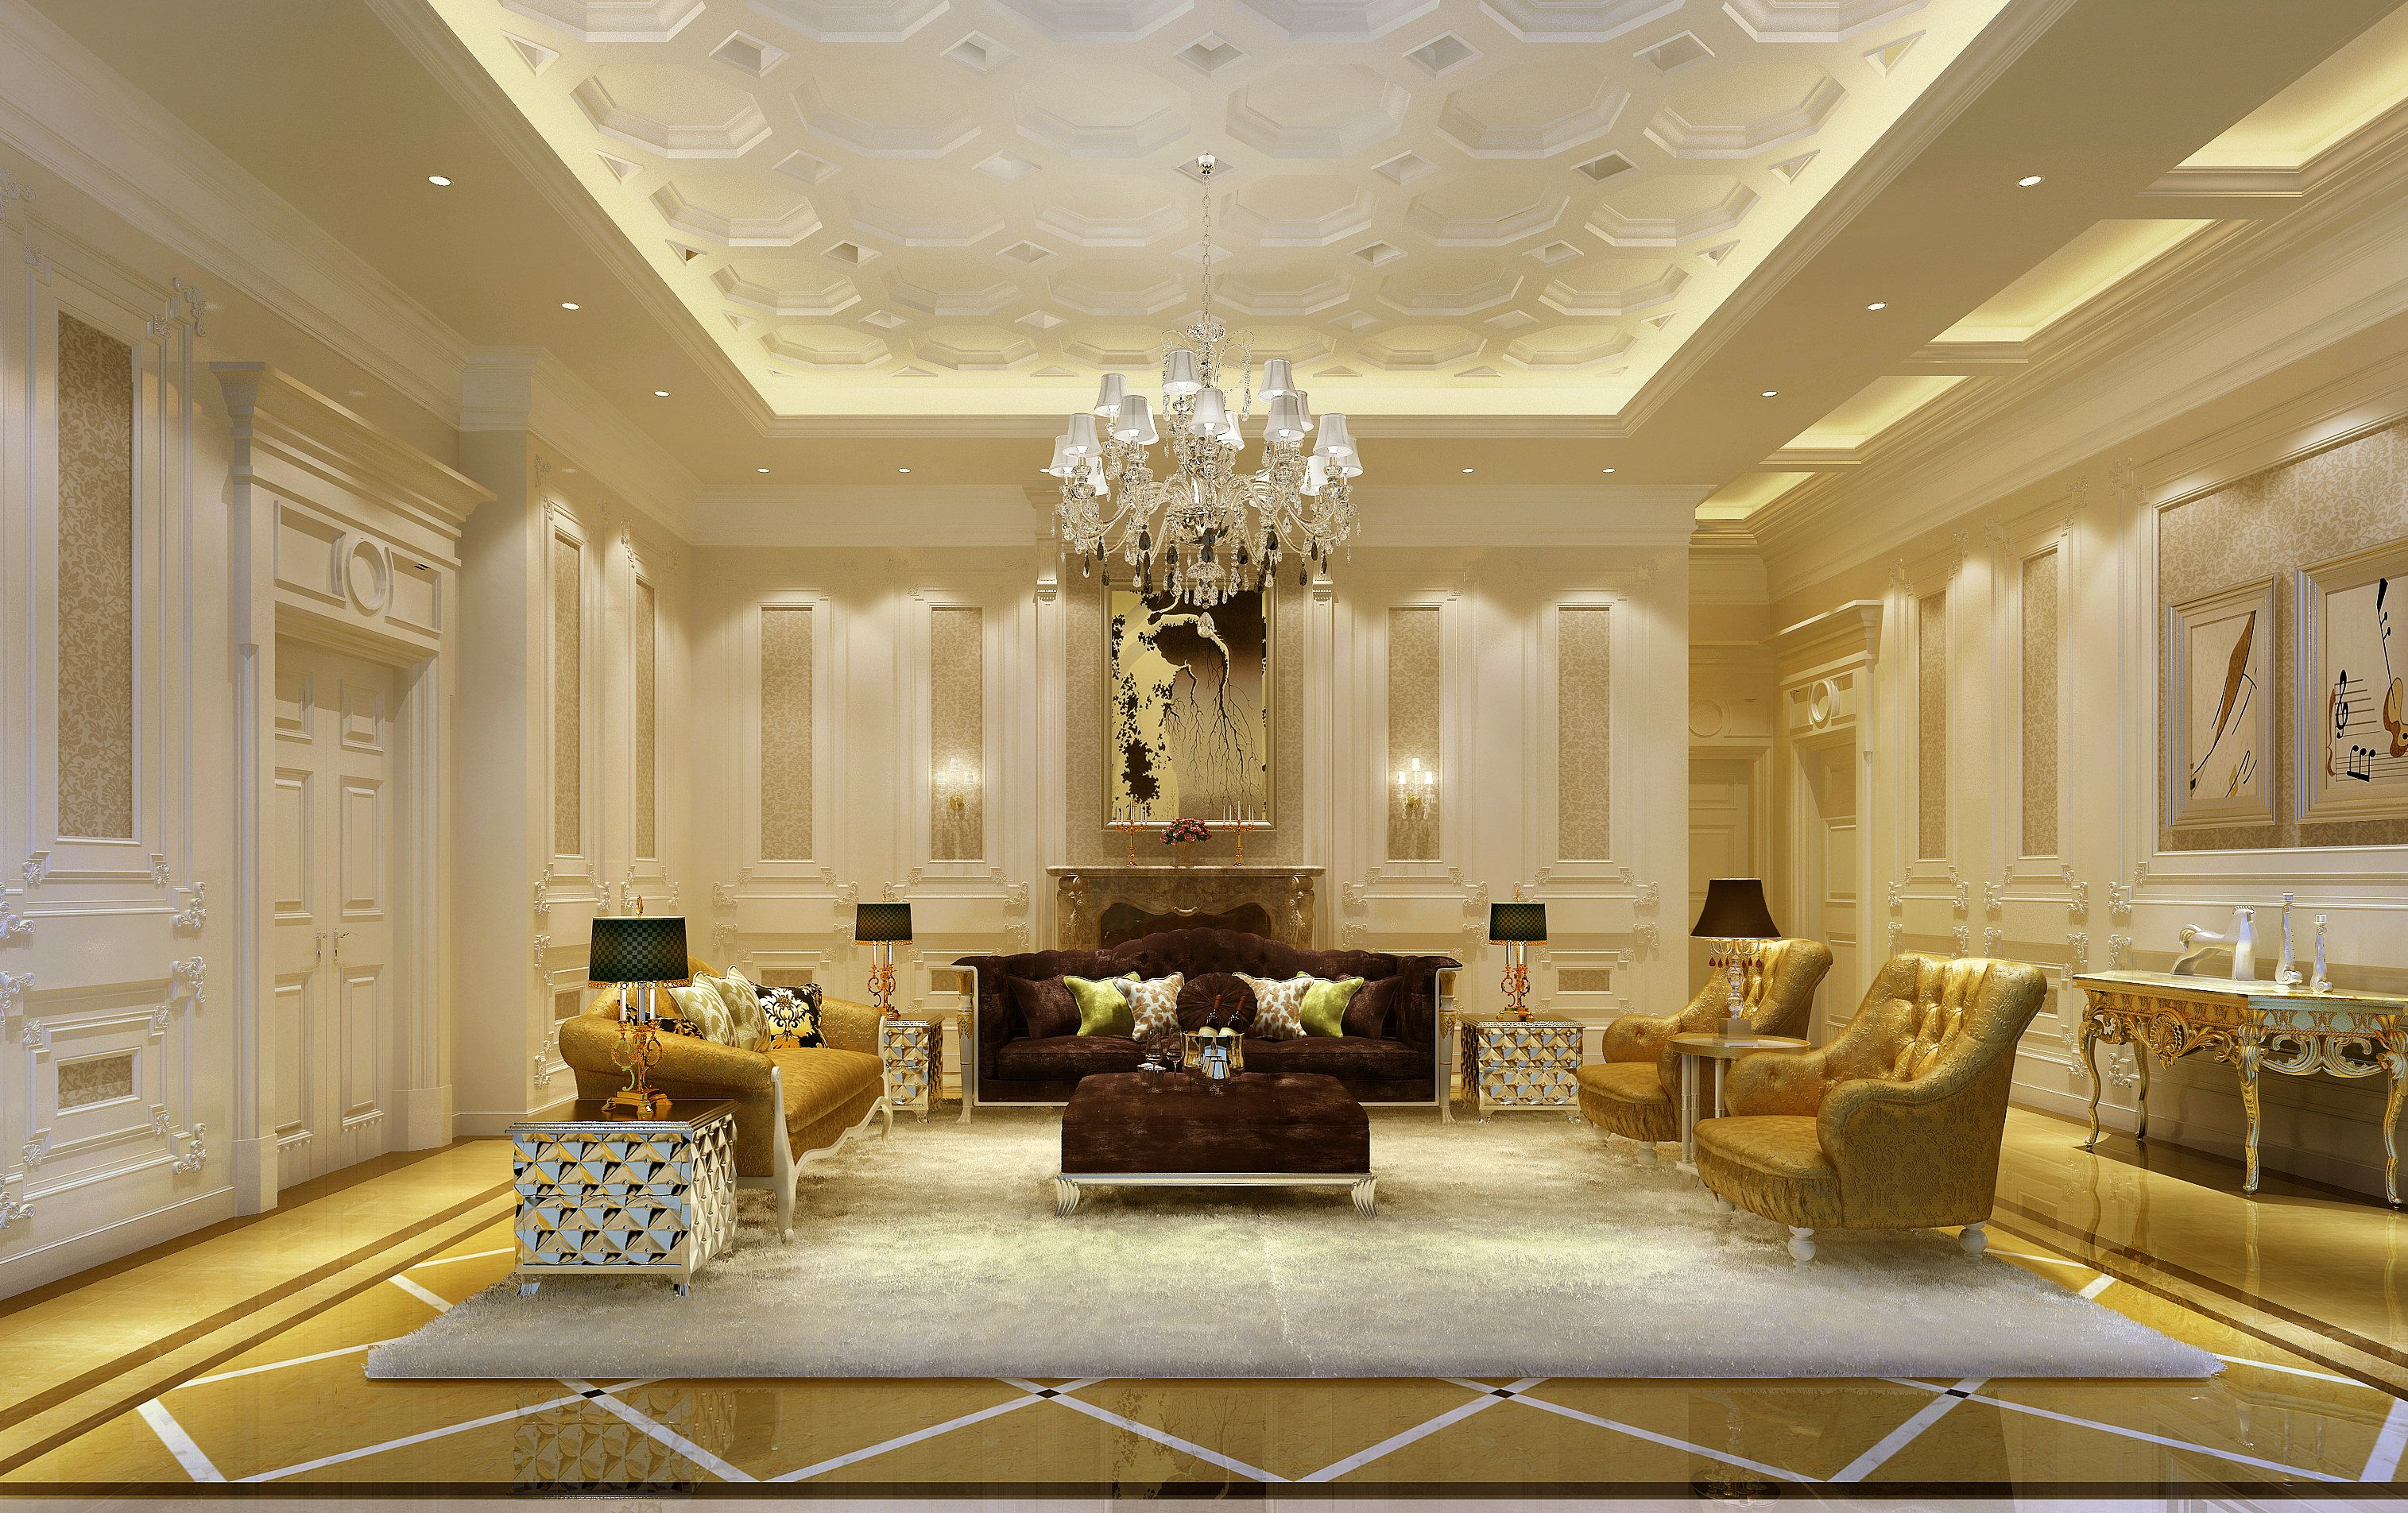 Luxury Living Rooms | Luxury Living Room 3d Model Living Room E109 3d Model  Luxury .